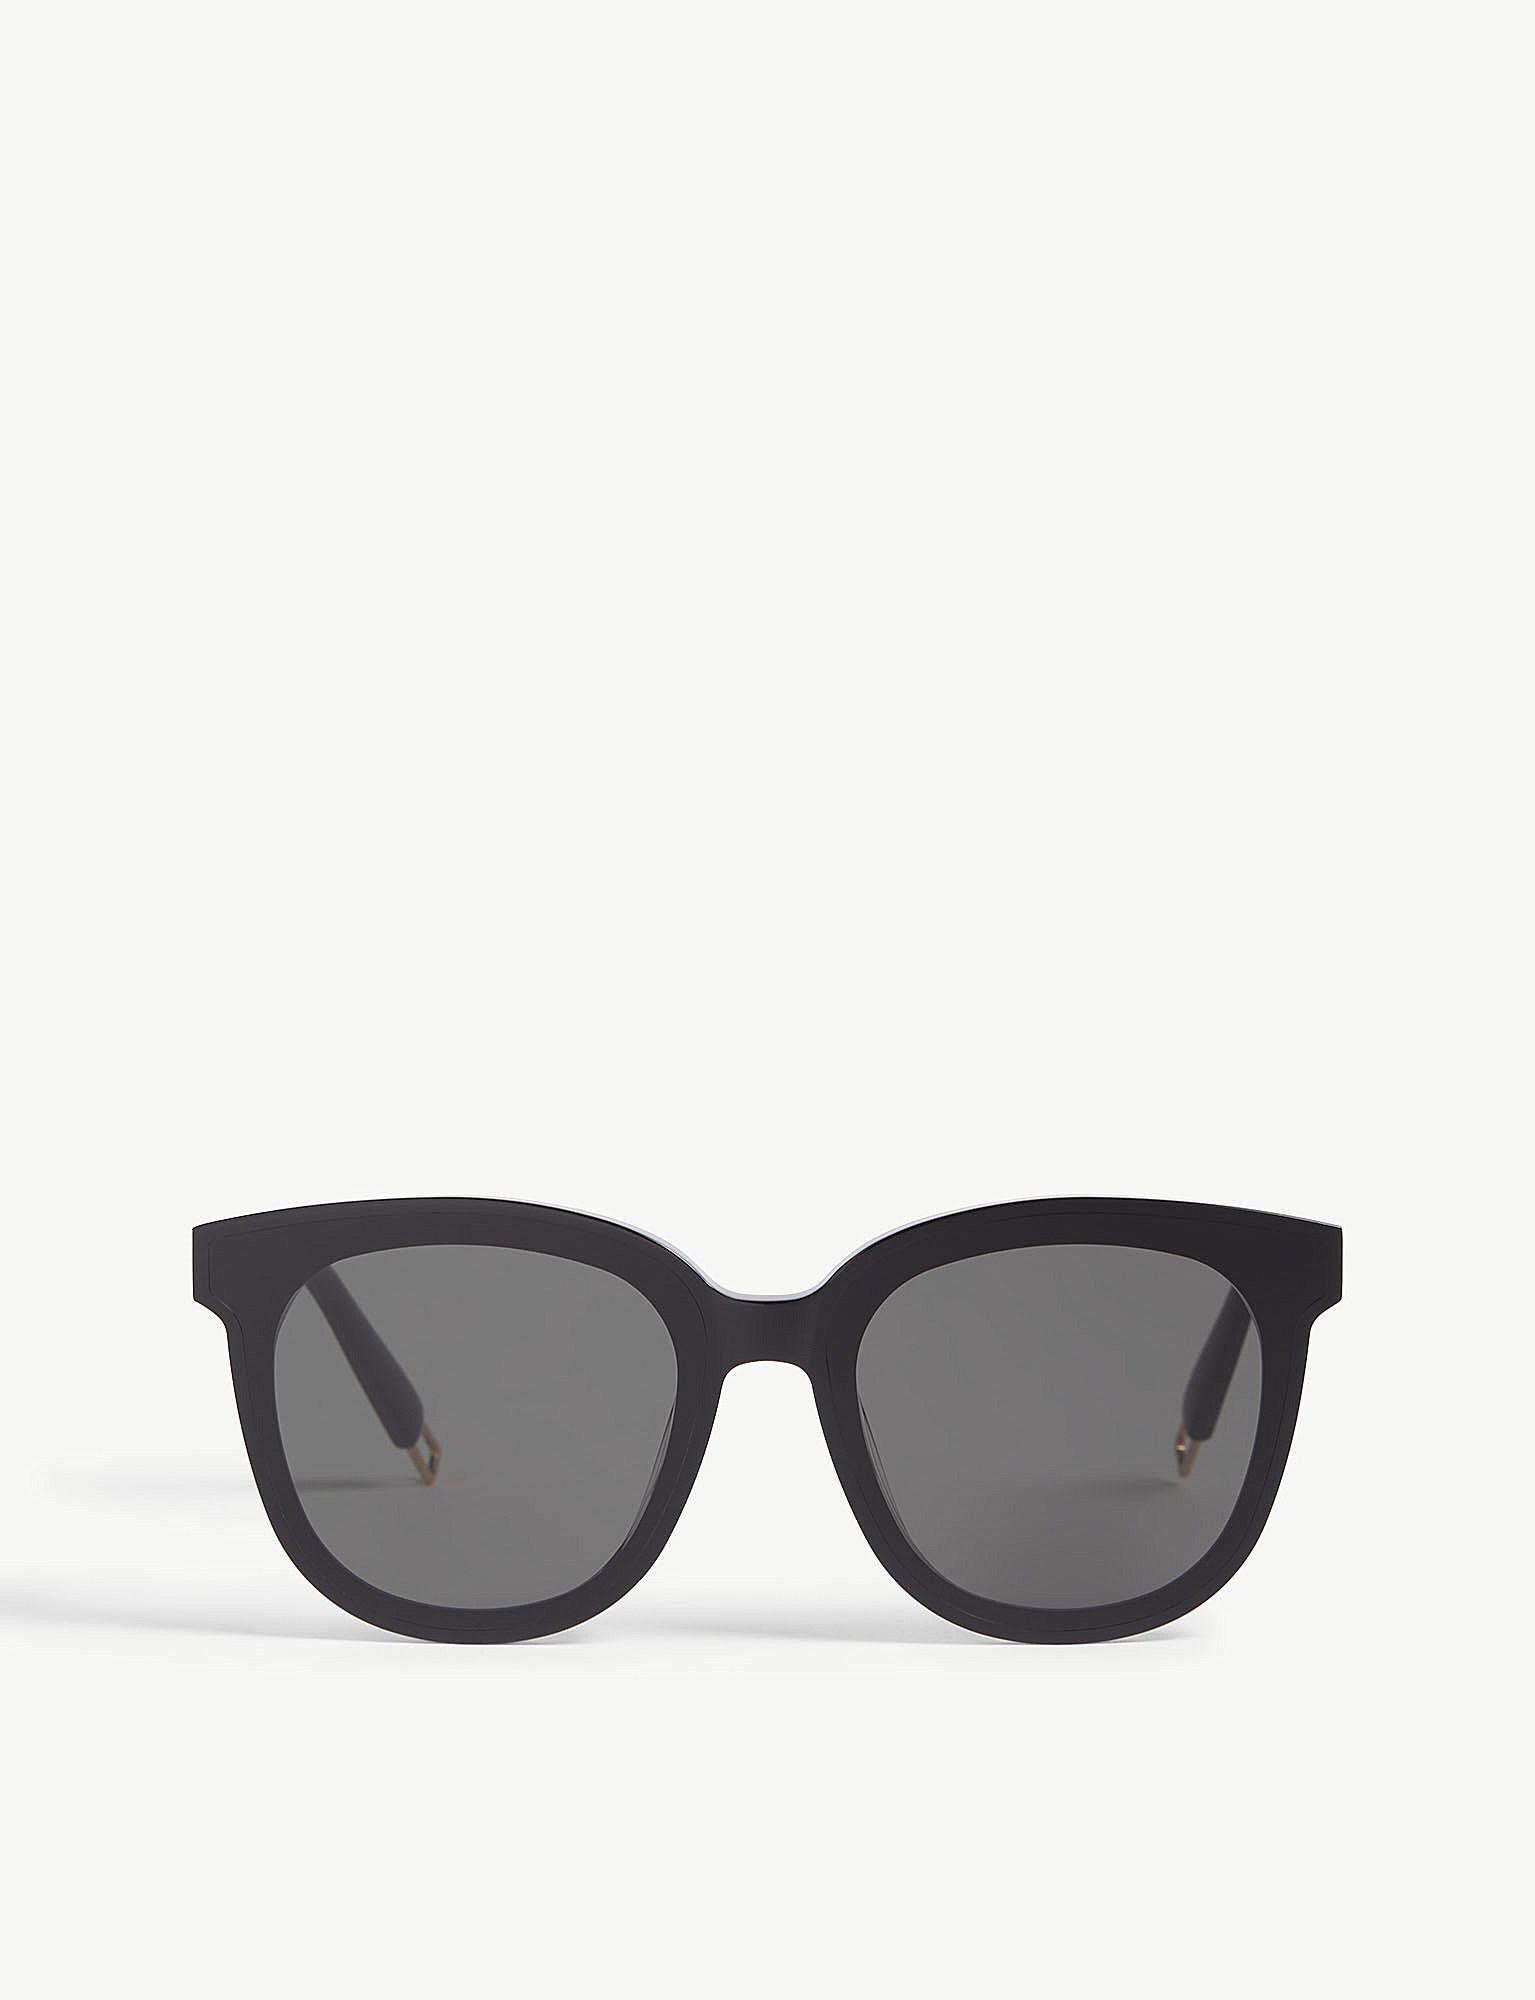 973c4e2faa6 Lyst - Gentle Monster Inscarlet Square-frame Sunglasses in Black